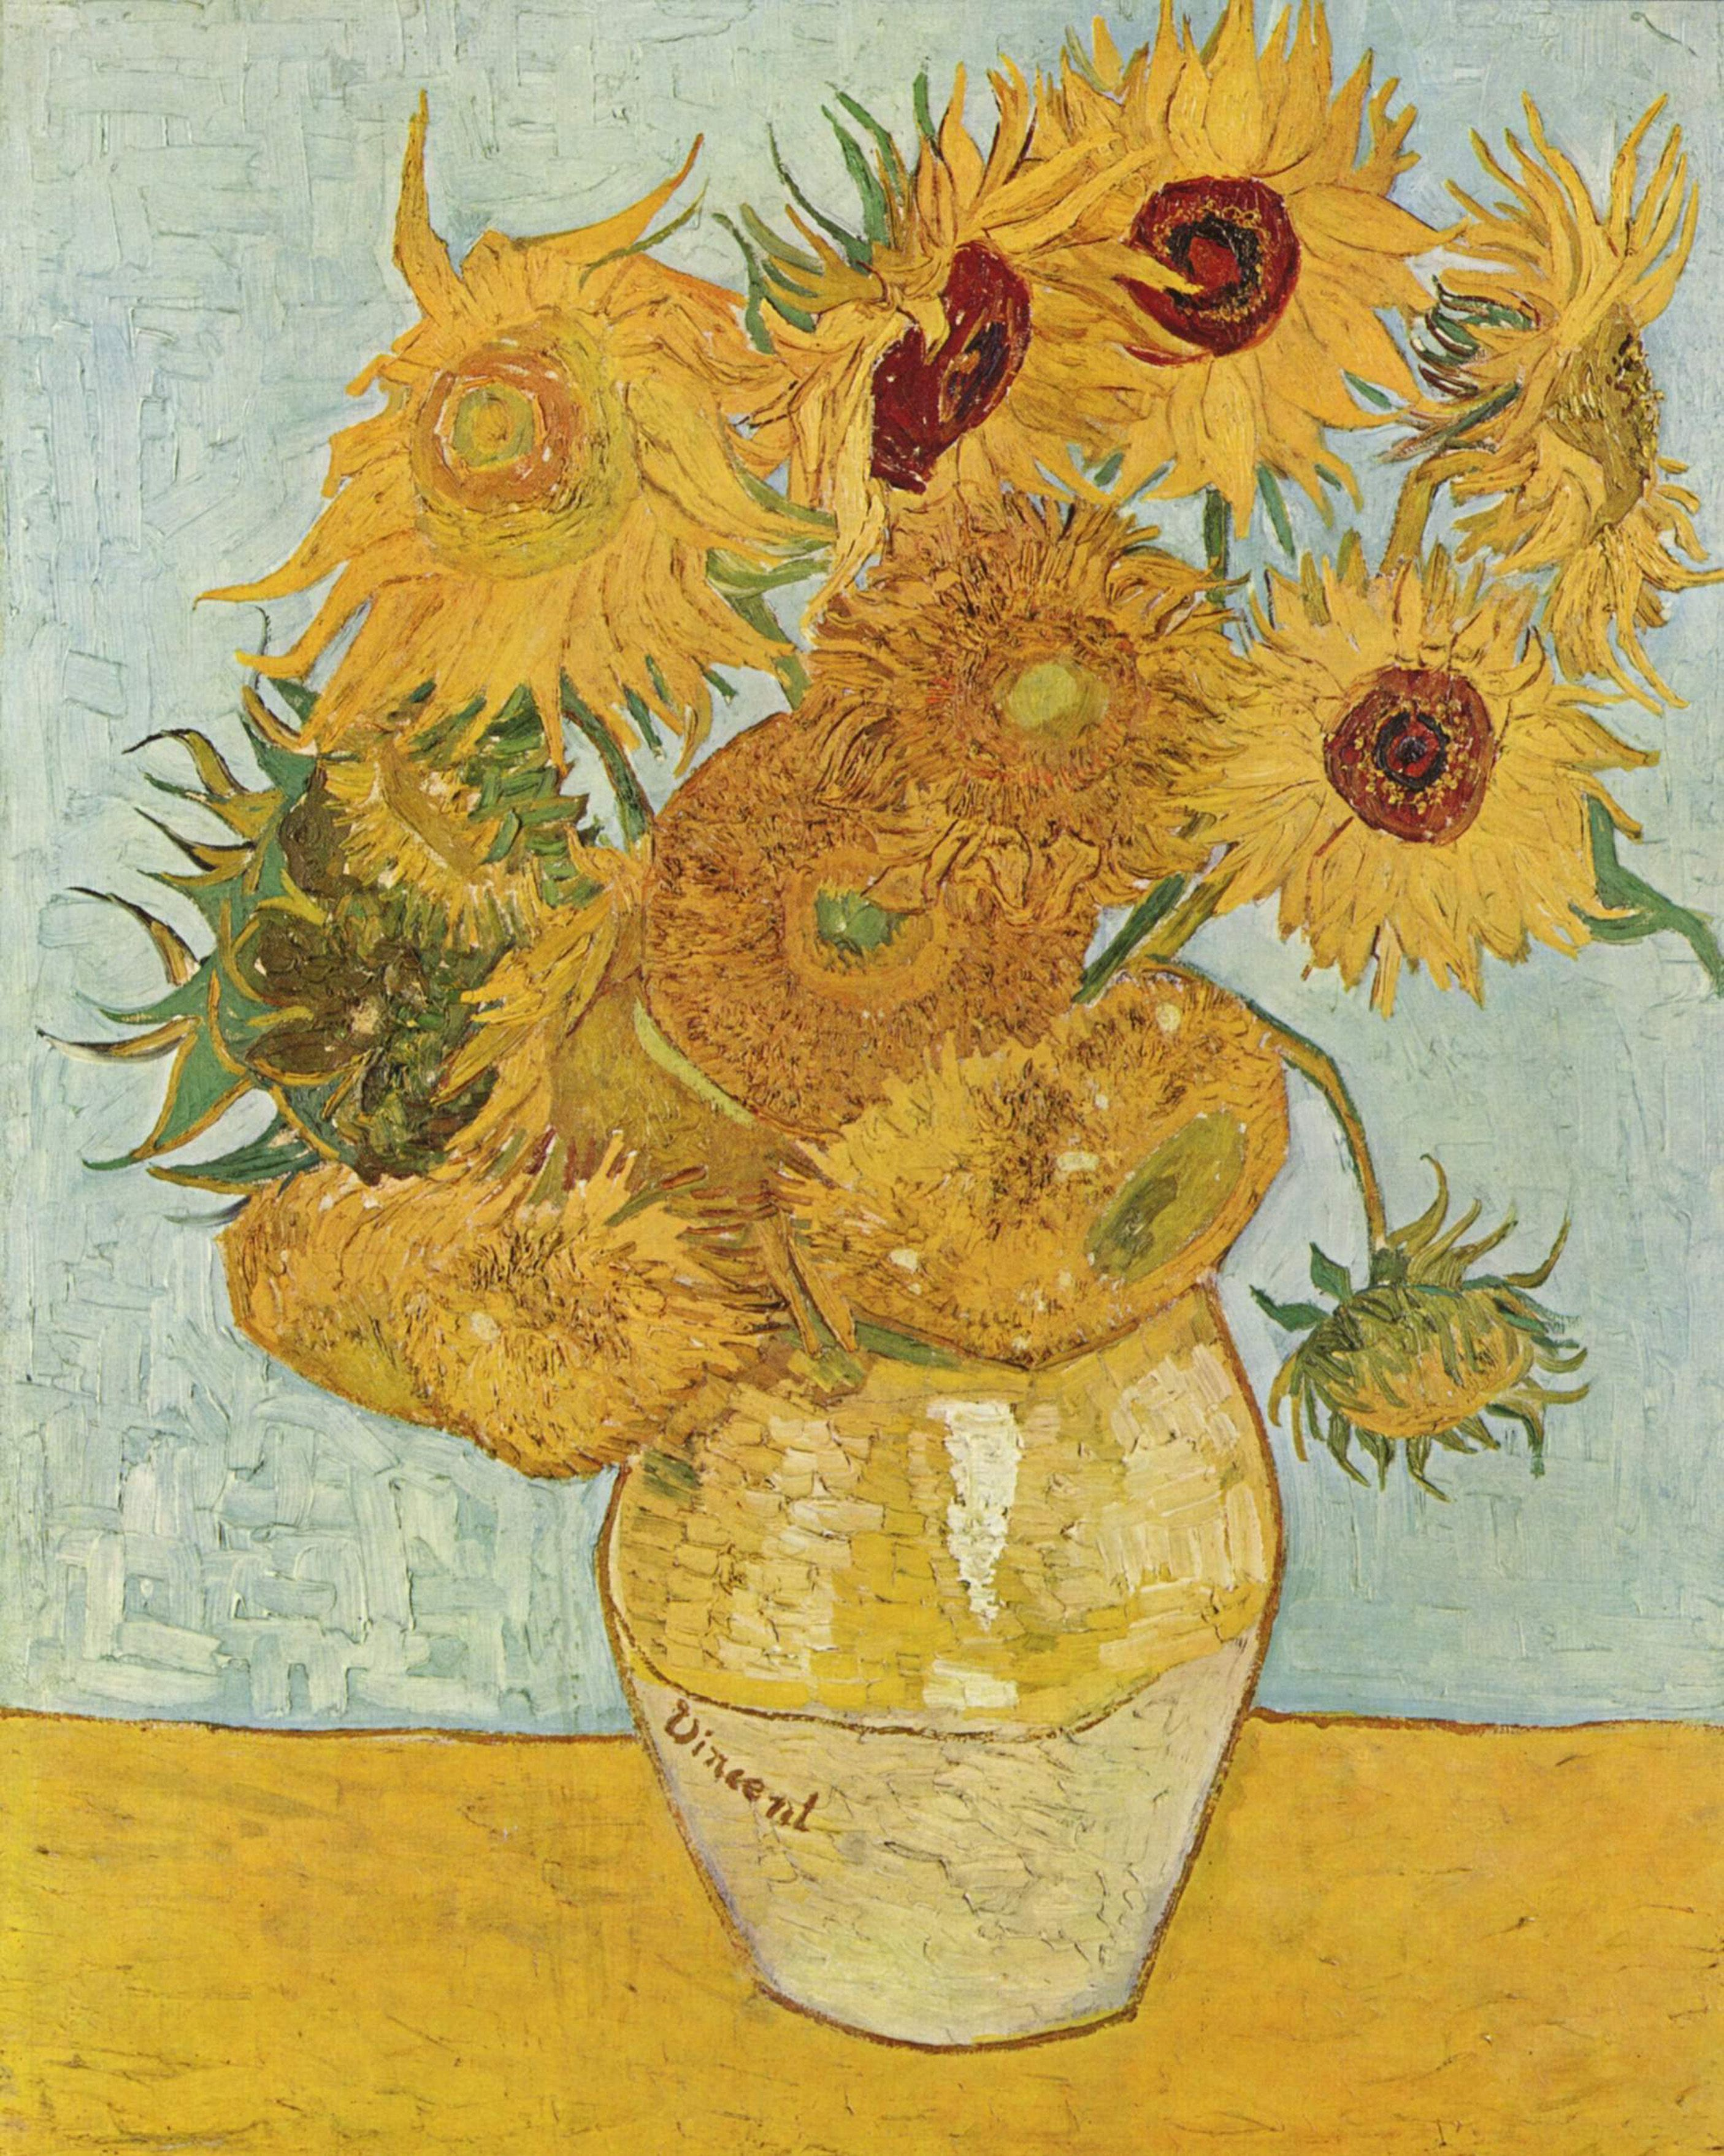 Van Gogh S True Colours Were Originally Even Brighter Van Gogh Art Van Gogh Paintings Vincent Van Gogh